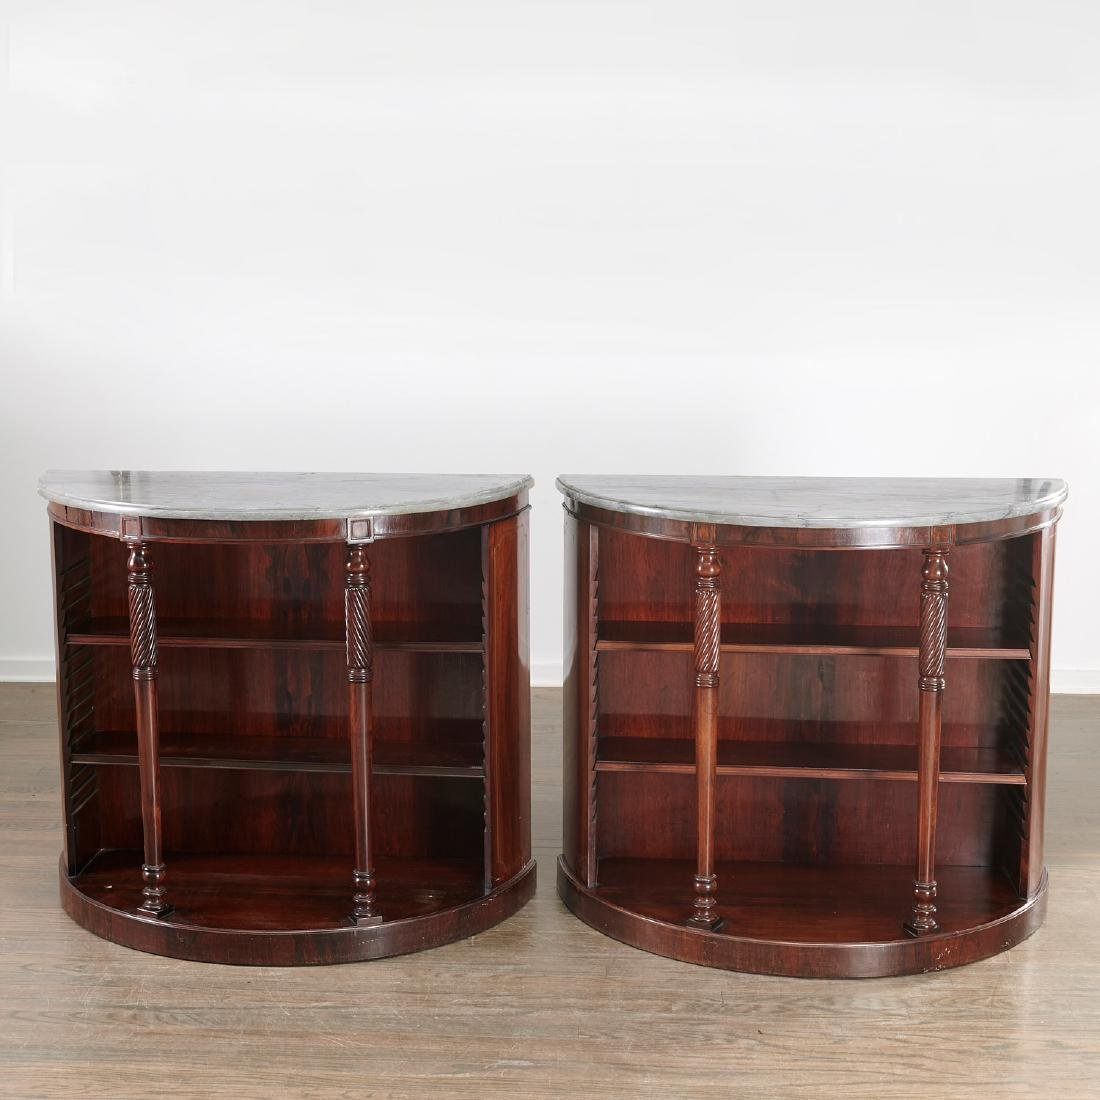 Pair Regency style demilune bookcases - 2